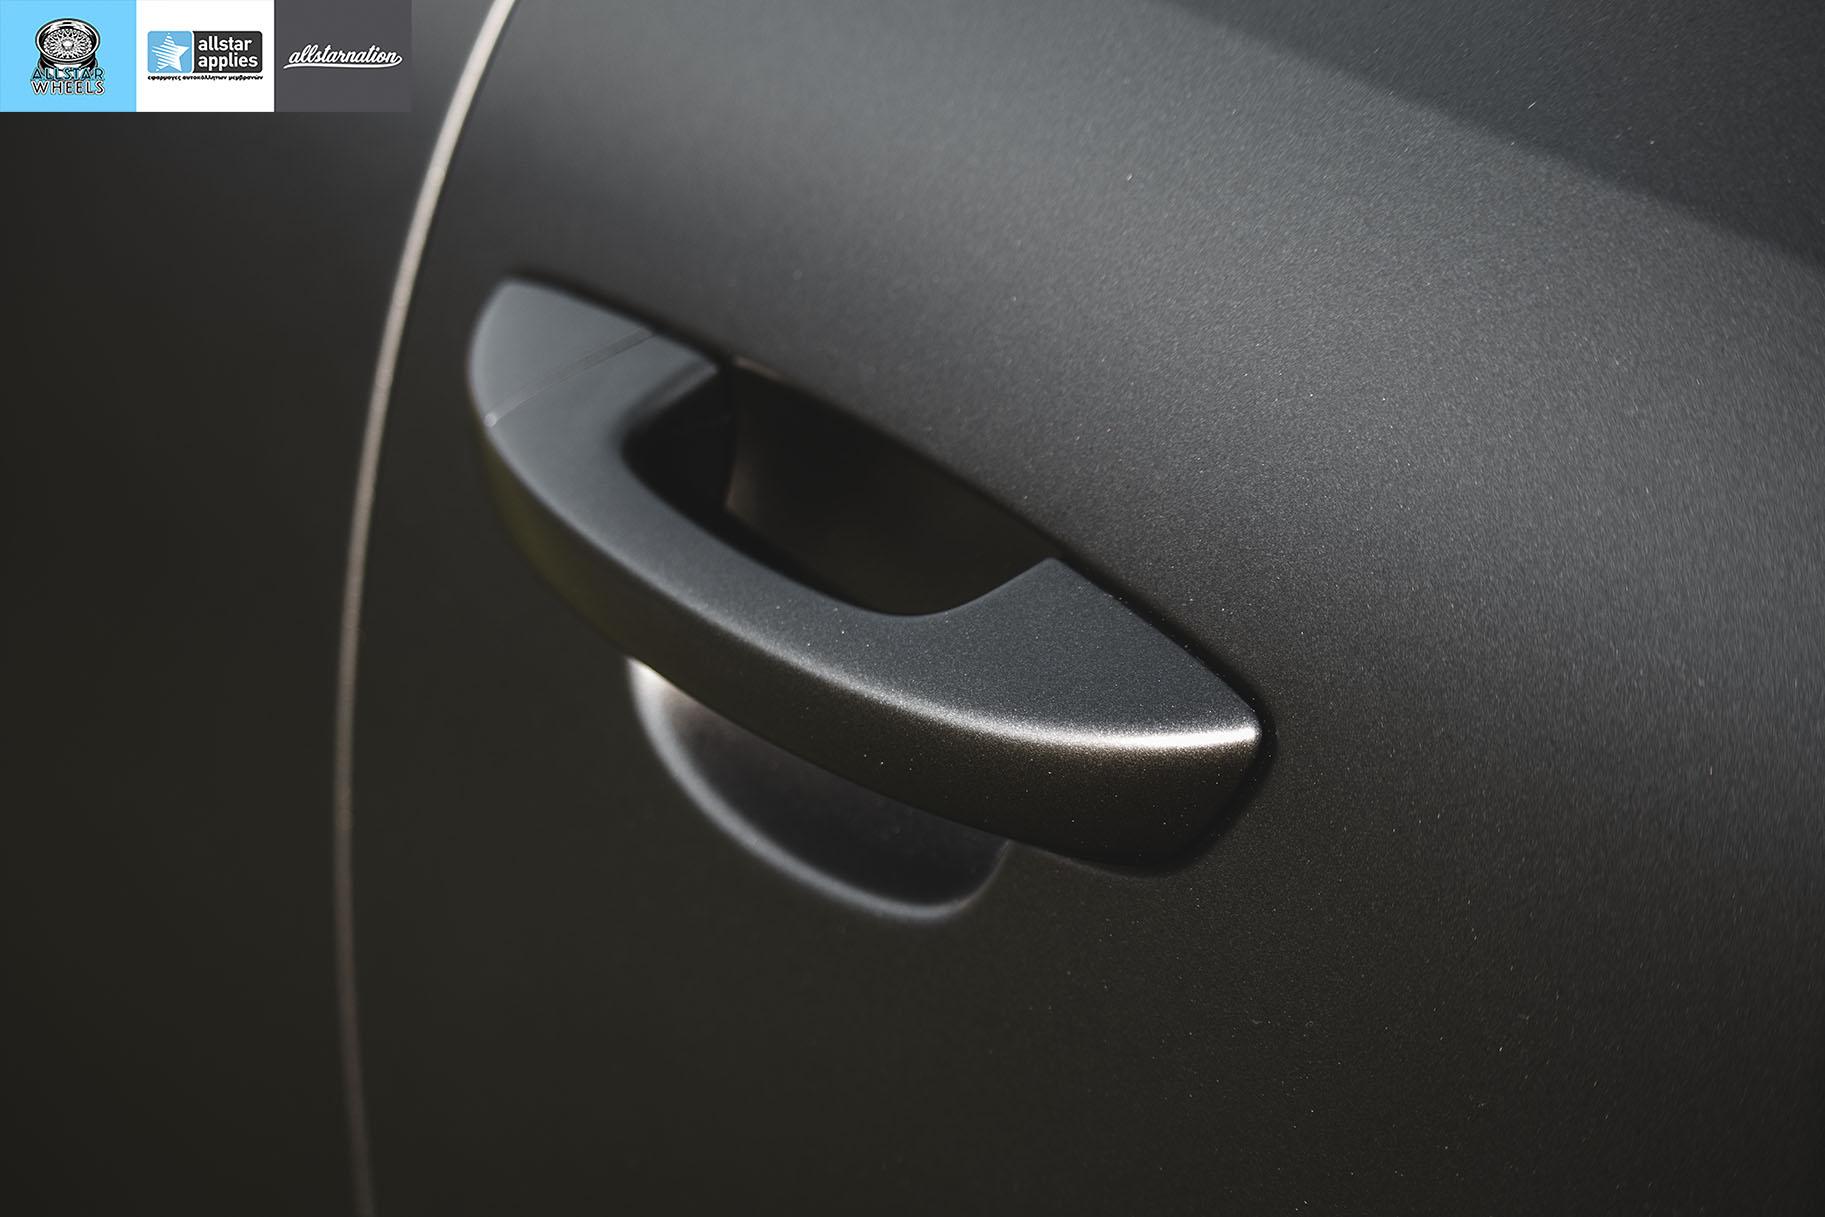 VW SCIROCCO MATT DIAMOND BLACK ALLSTAR APPLIES (11)